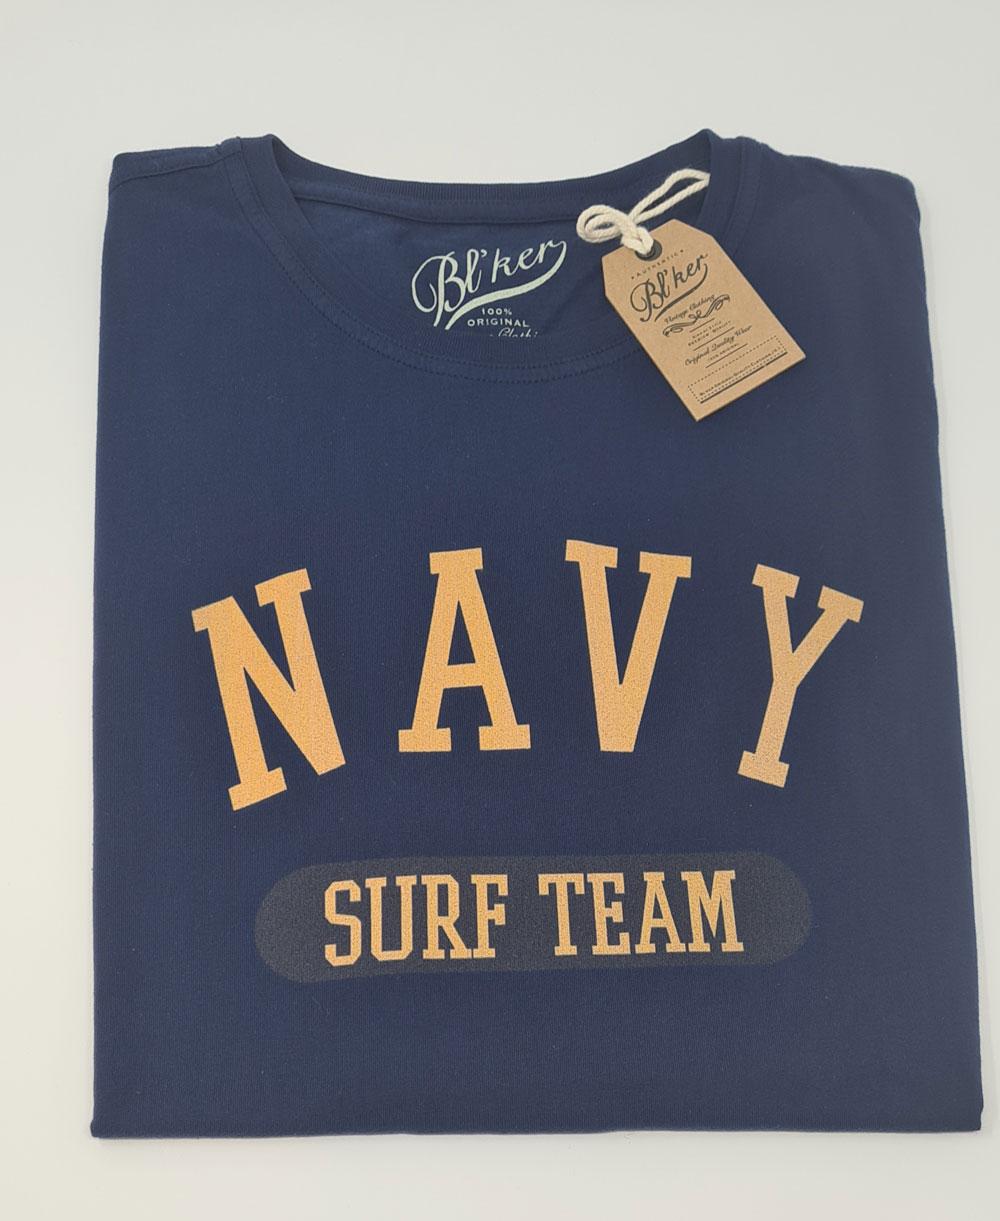 Herren Kurzarm T-Shirt Navy Surf Team Navy